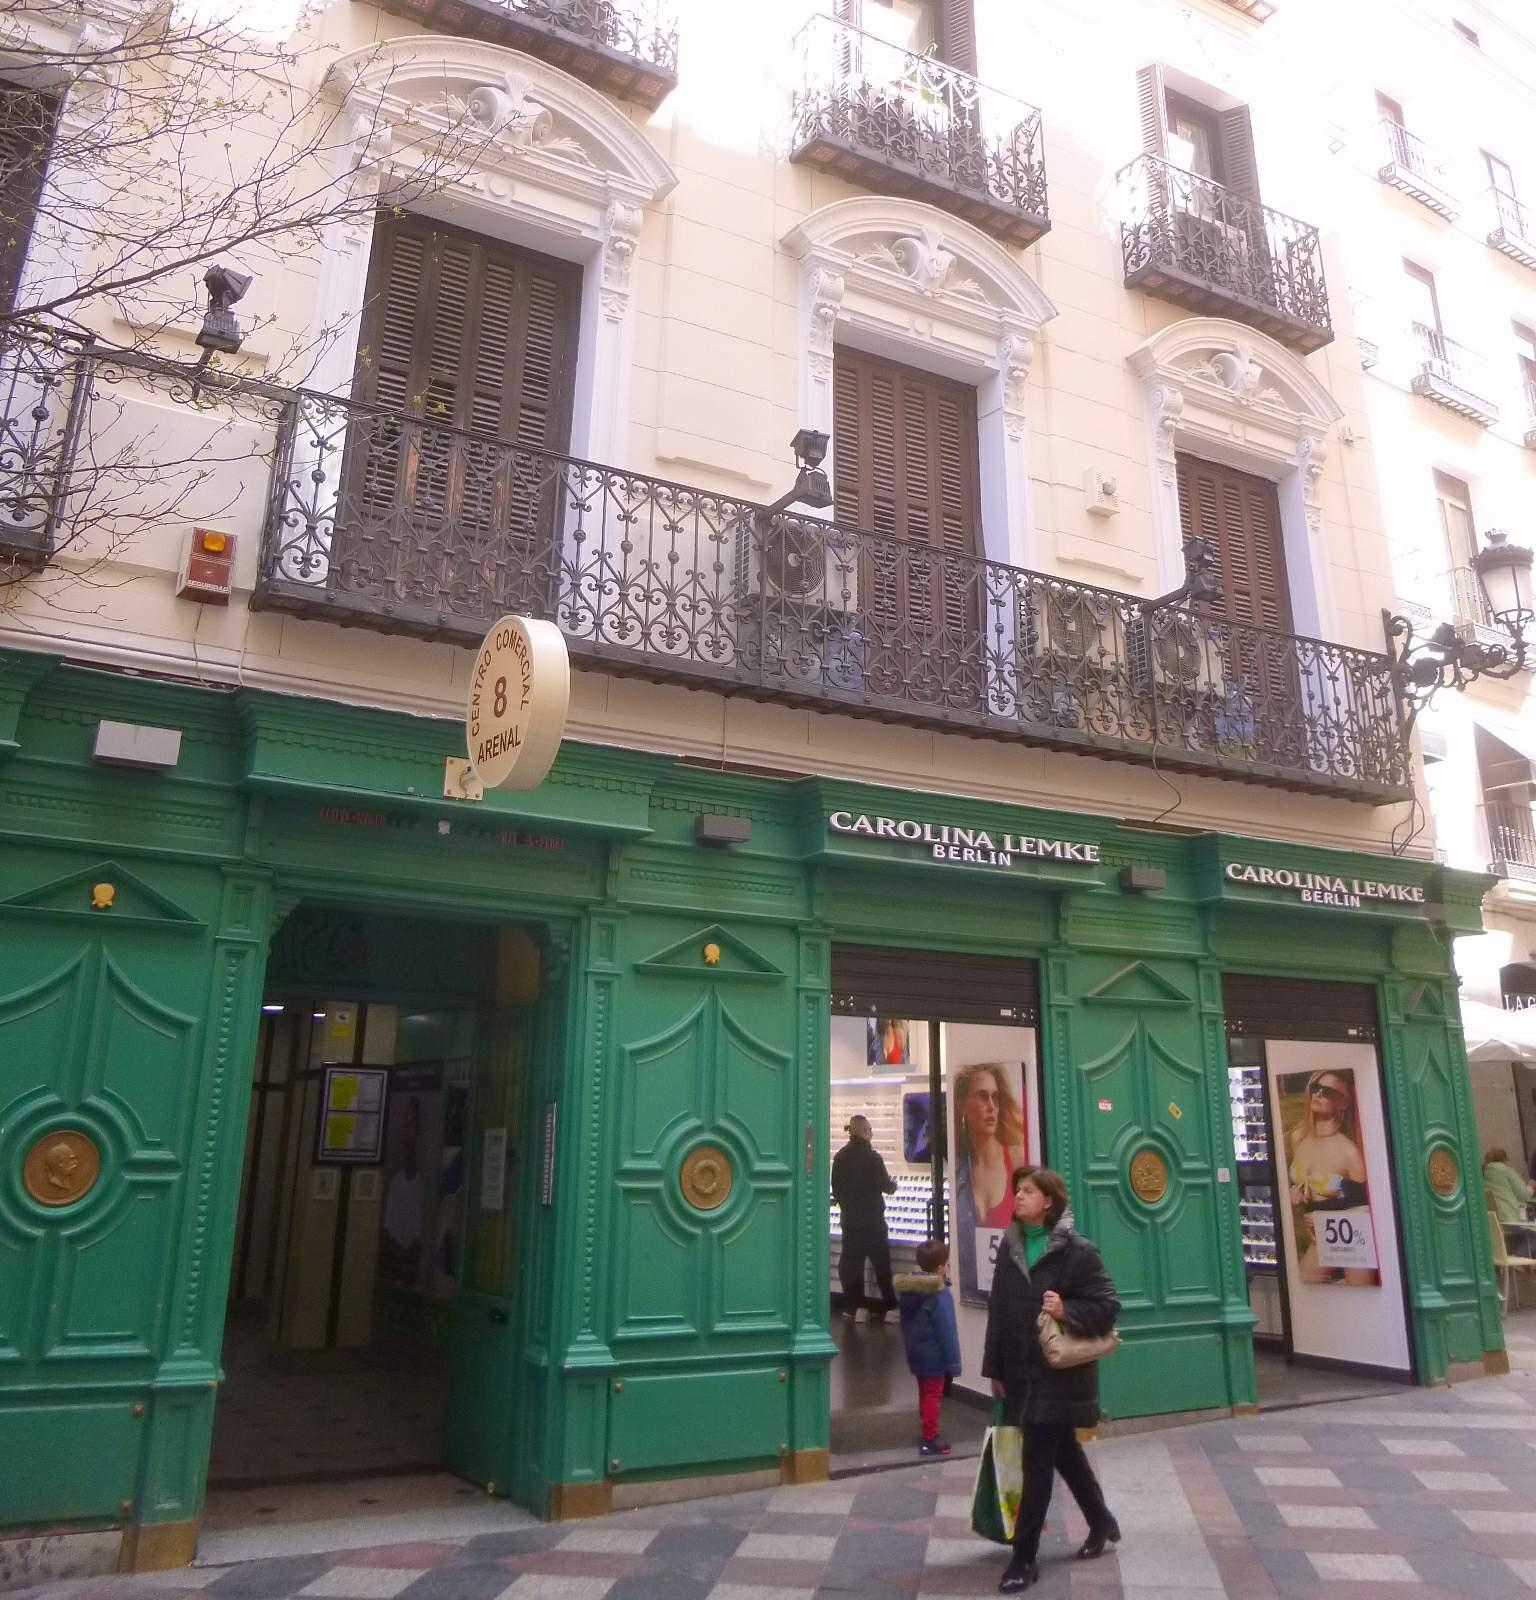 bd2e1c102a File:Madrid - Calle del Arenal, óptica Carolina Lemke Berlín 2.jpg ...